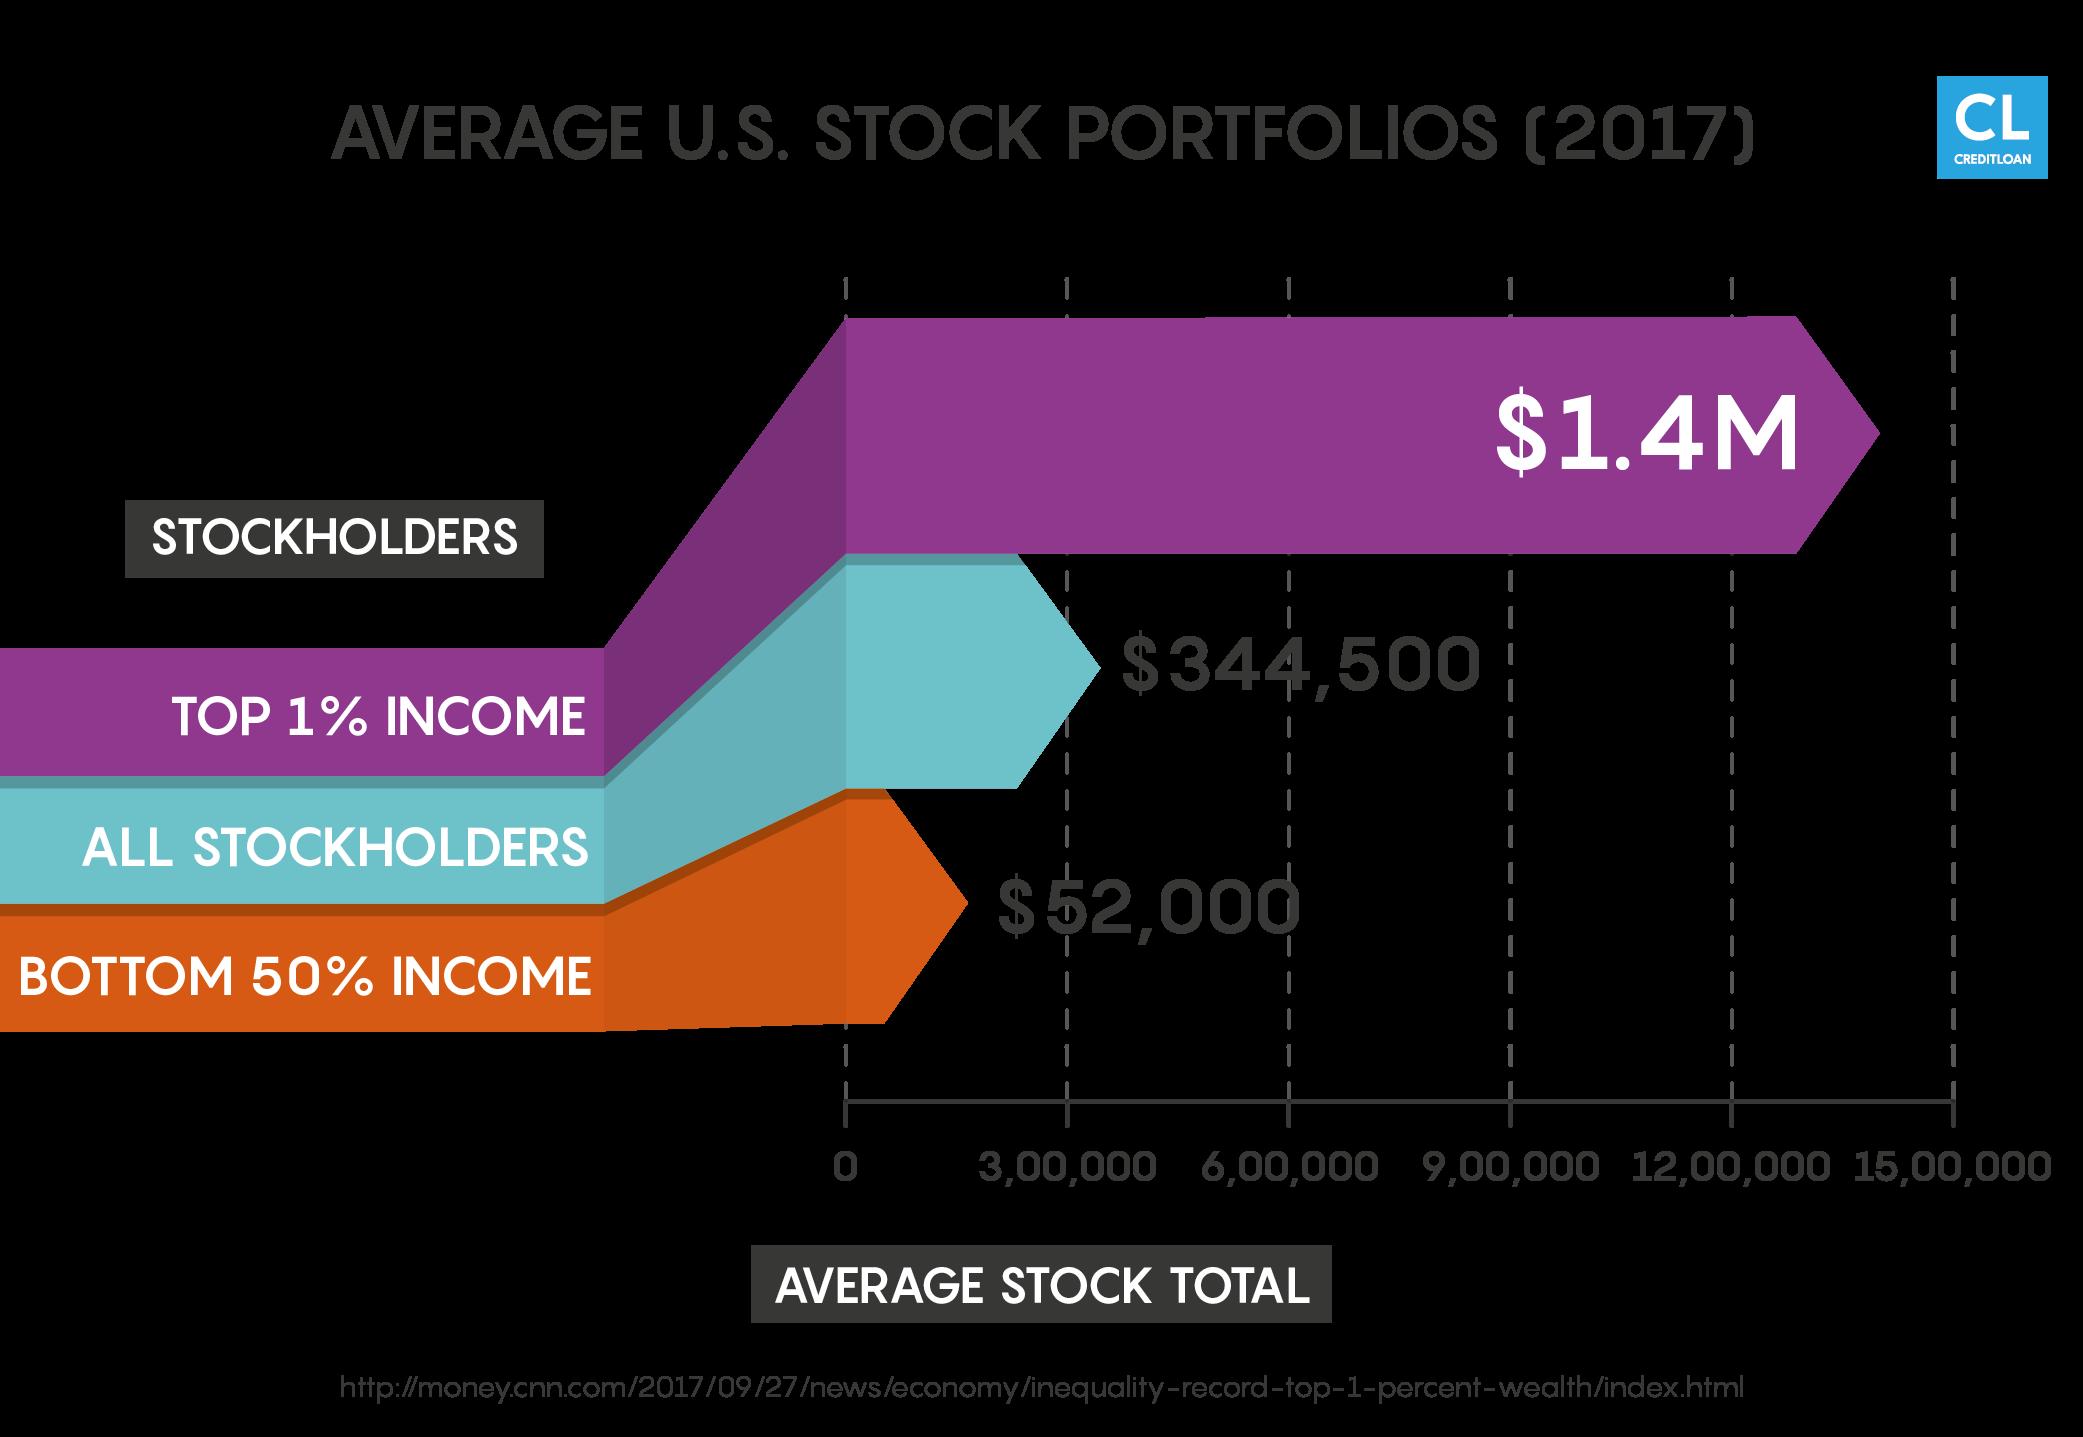 U.S. Stock Portfolios